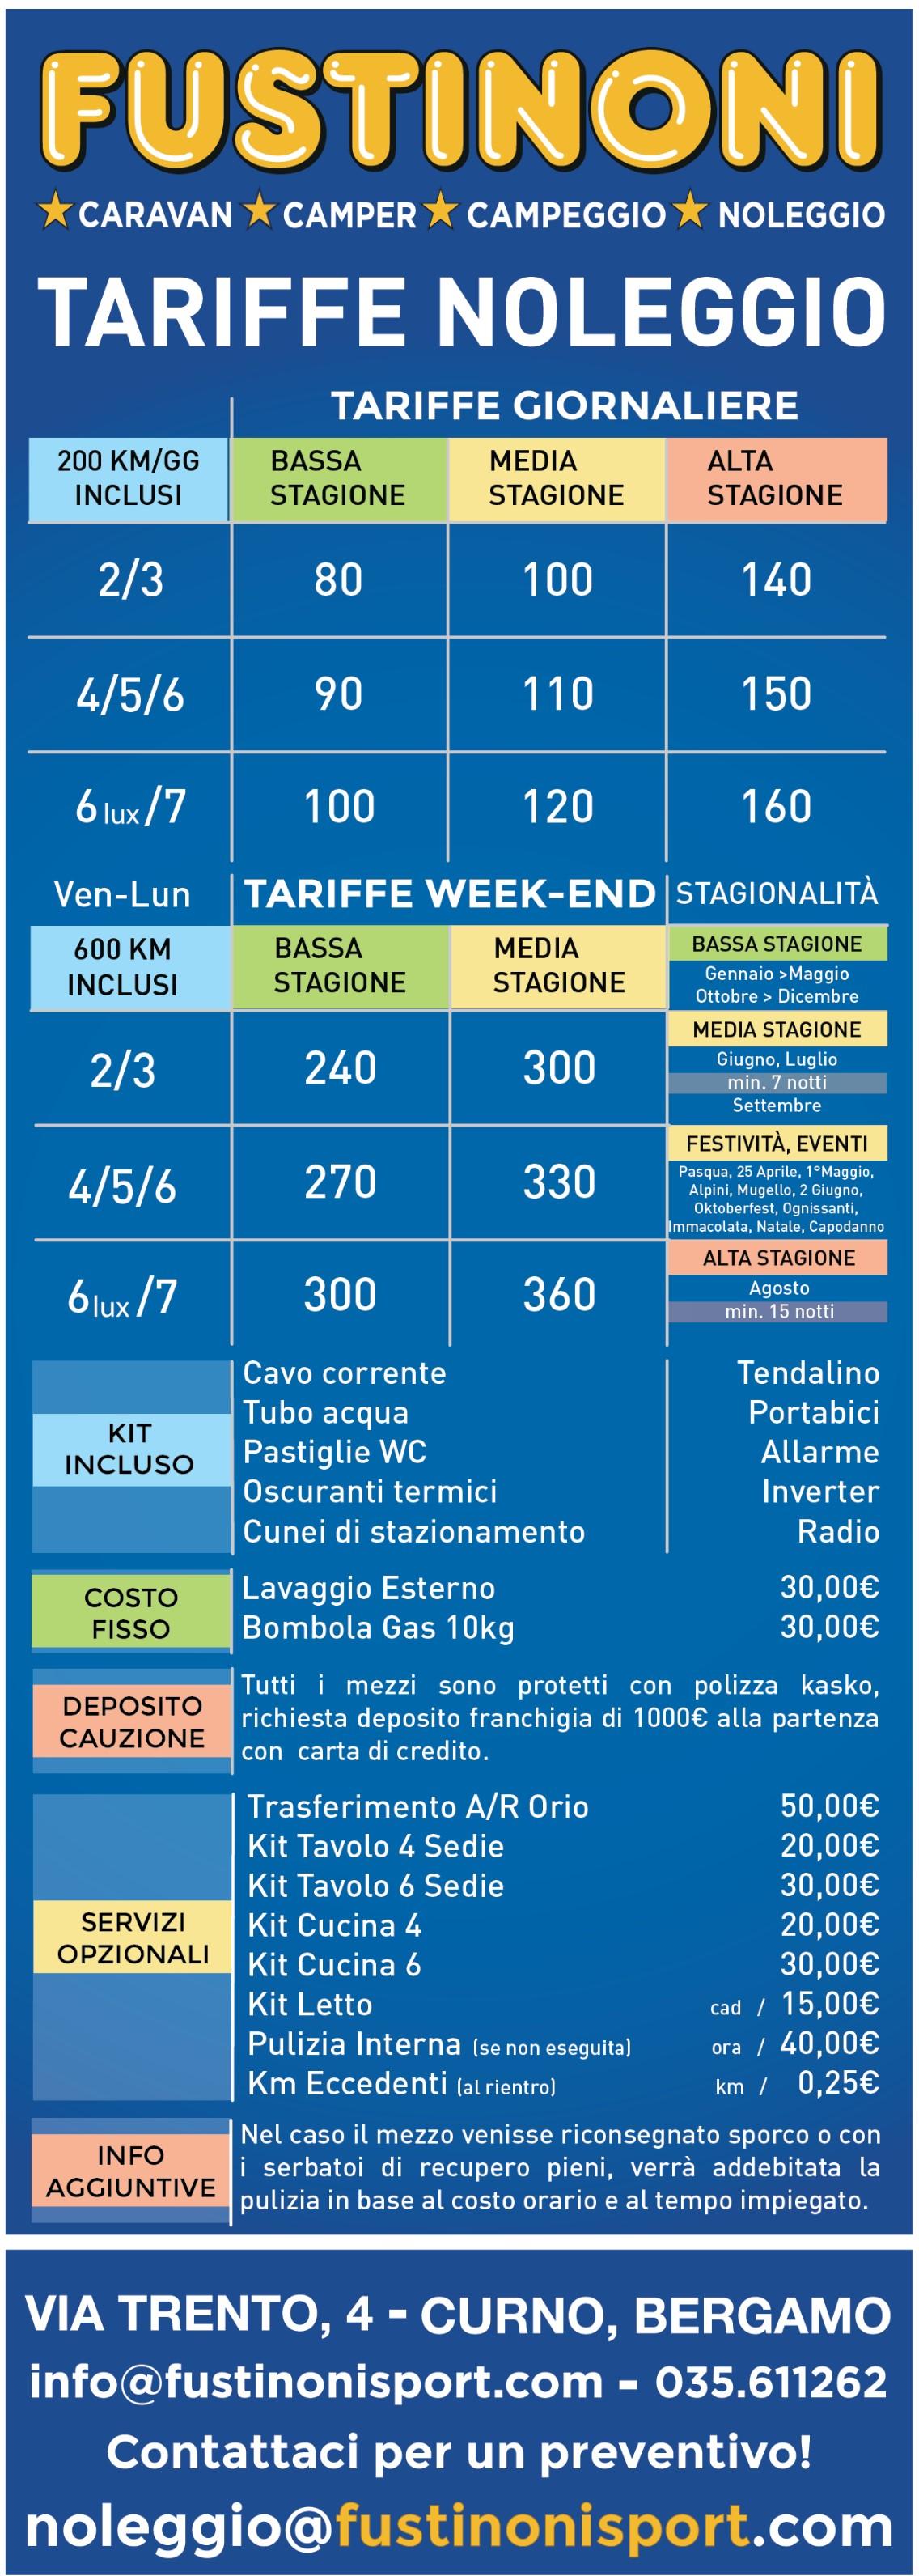 tariffe-noleggio-camper-2019-20-fustinoni-bergamo